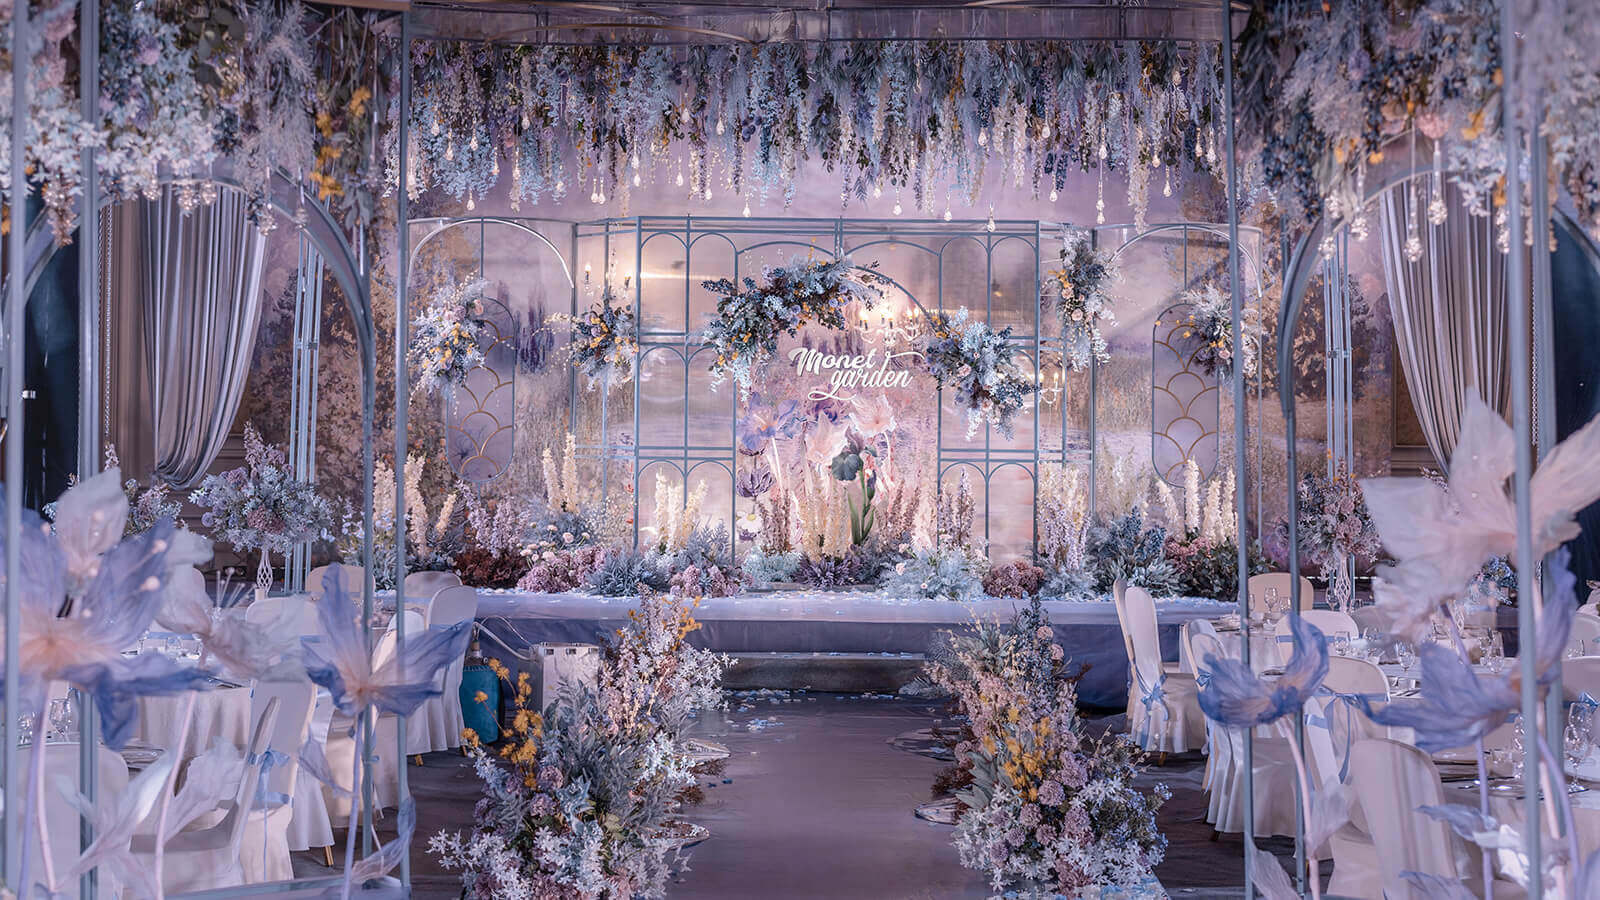 福清市婚礼策划方案:莫奈